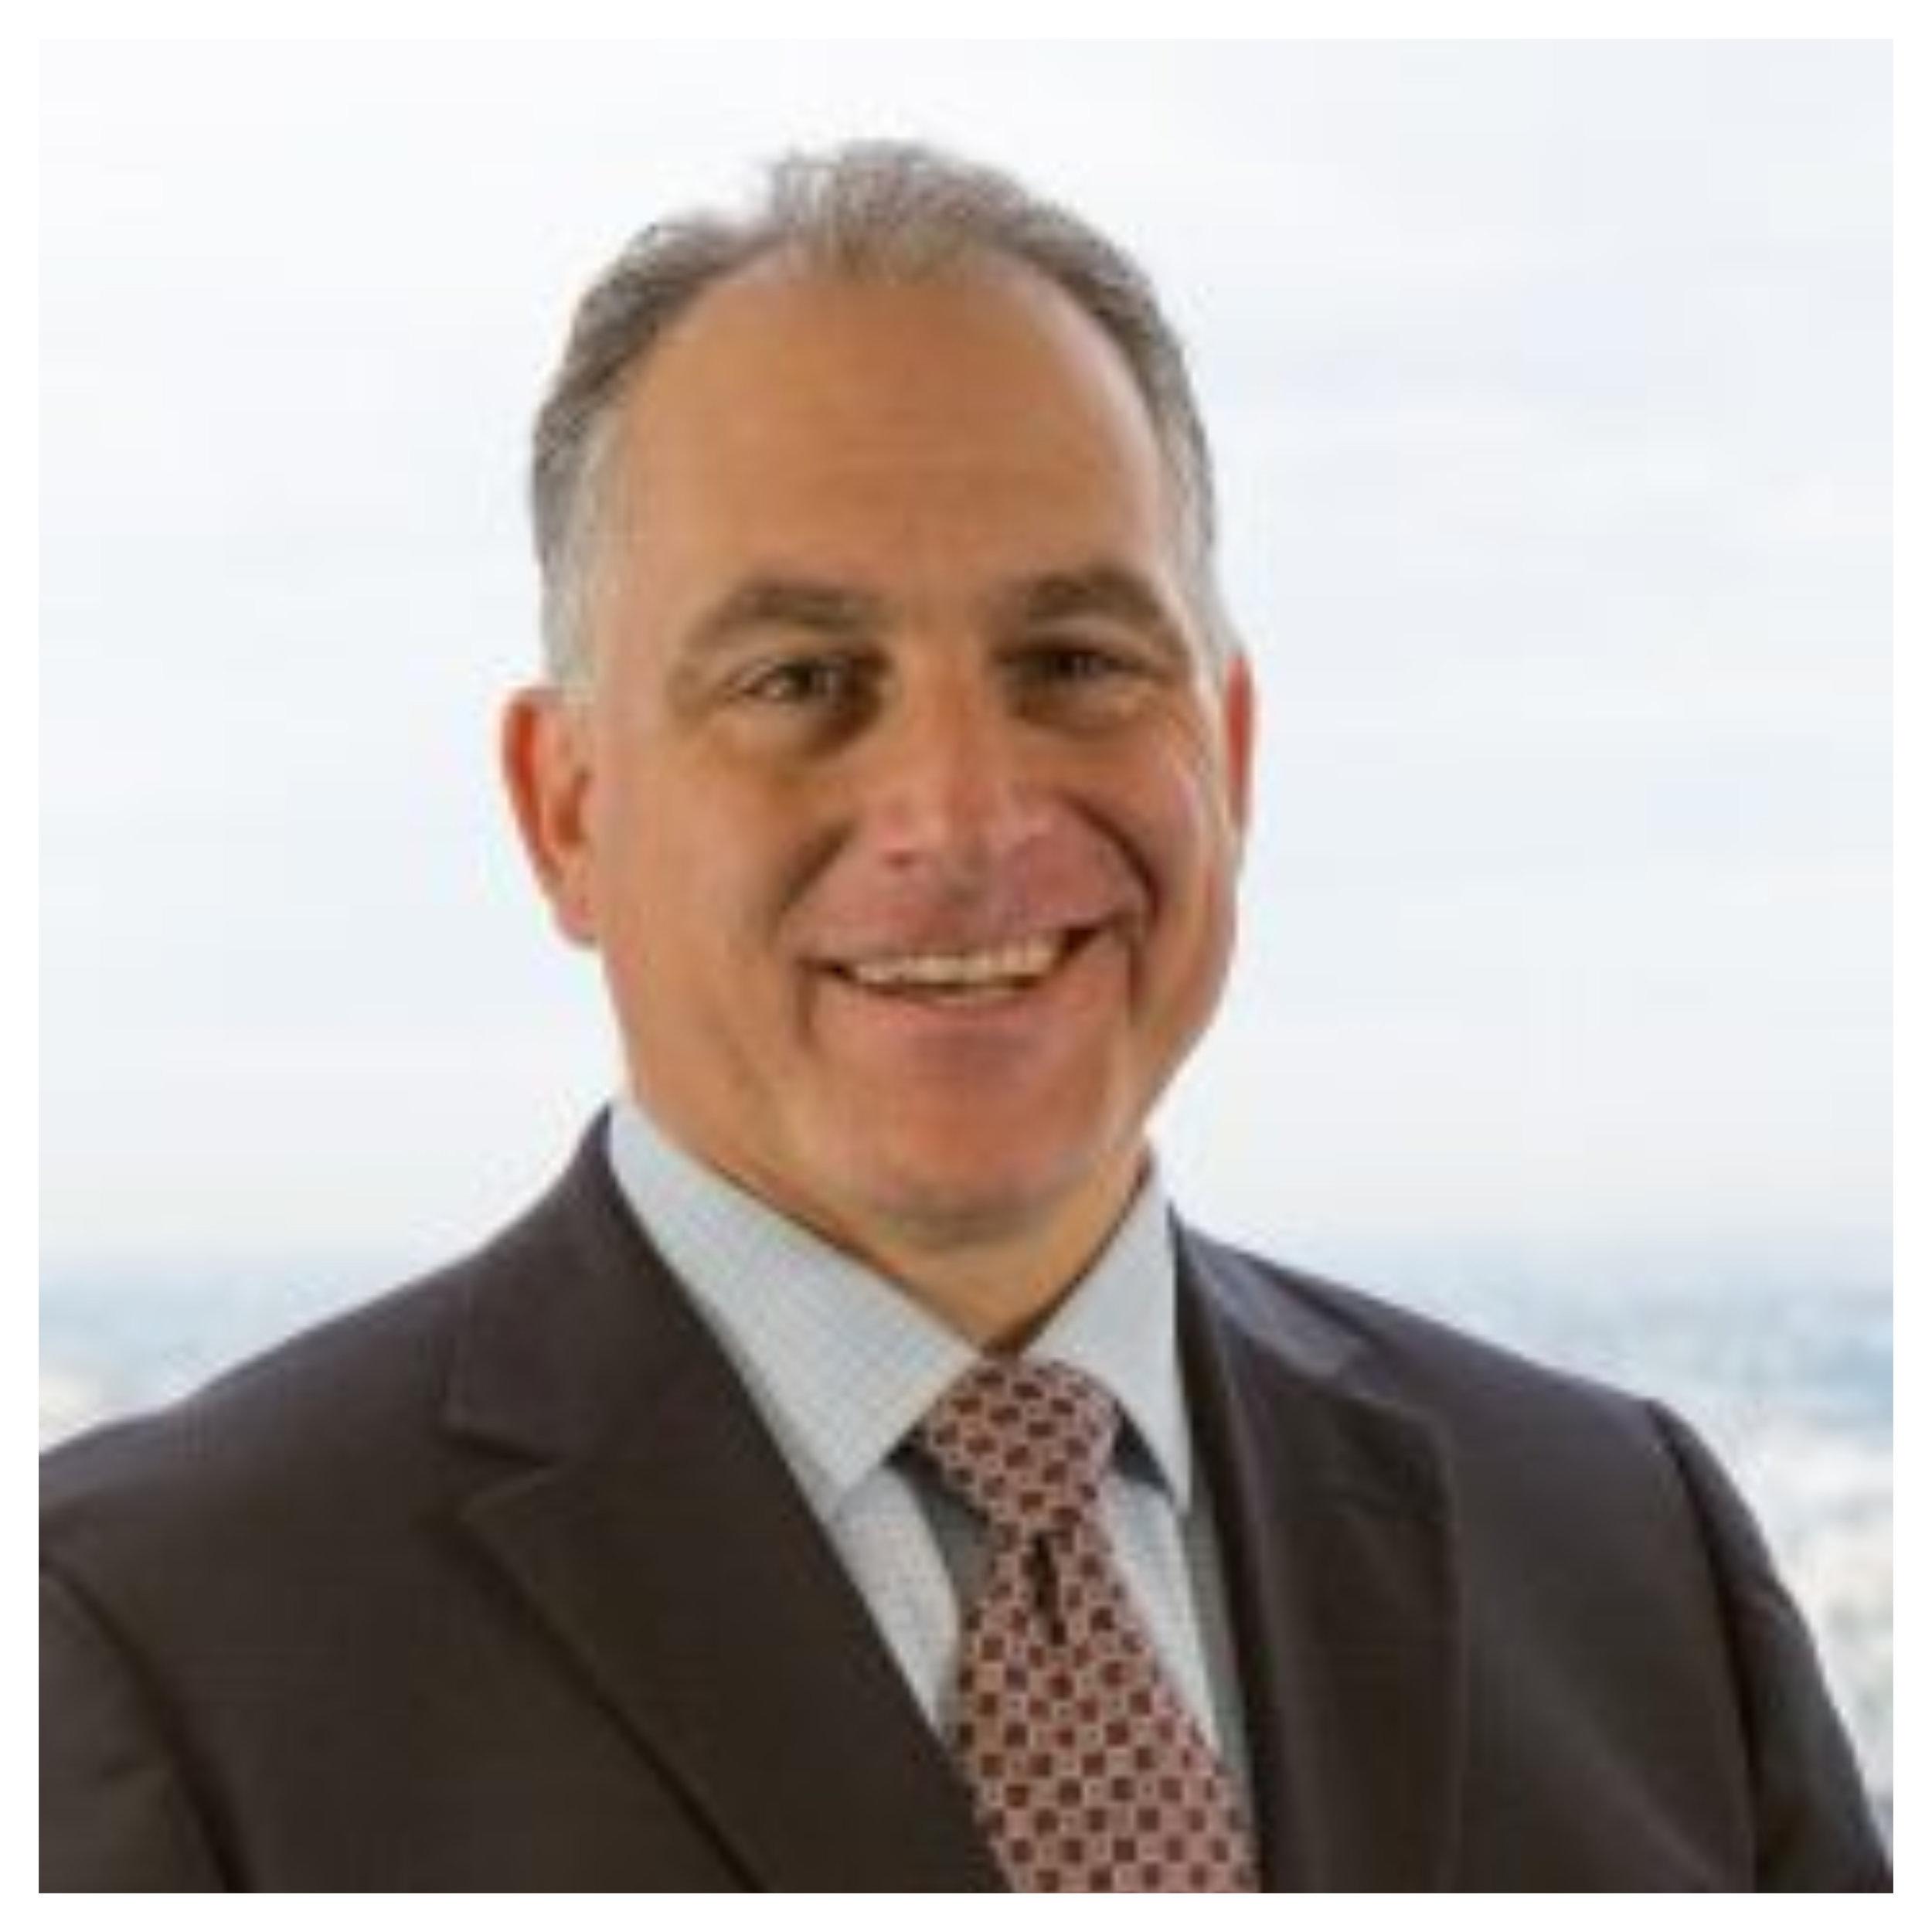 Matt Tice, CEO, Insurgence Group